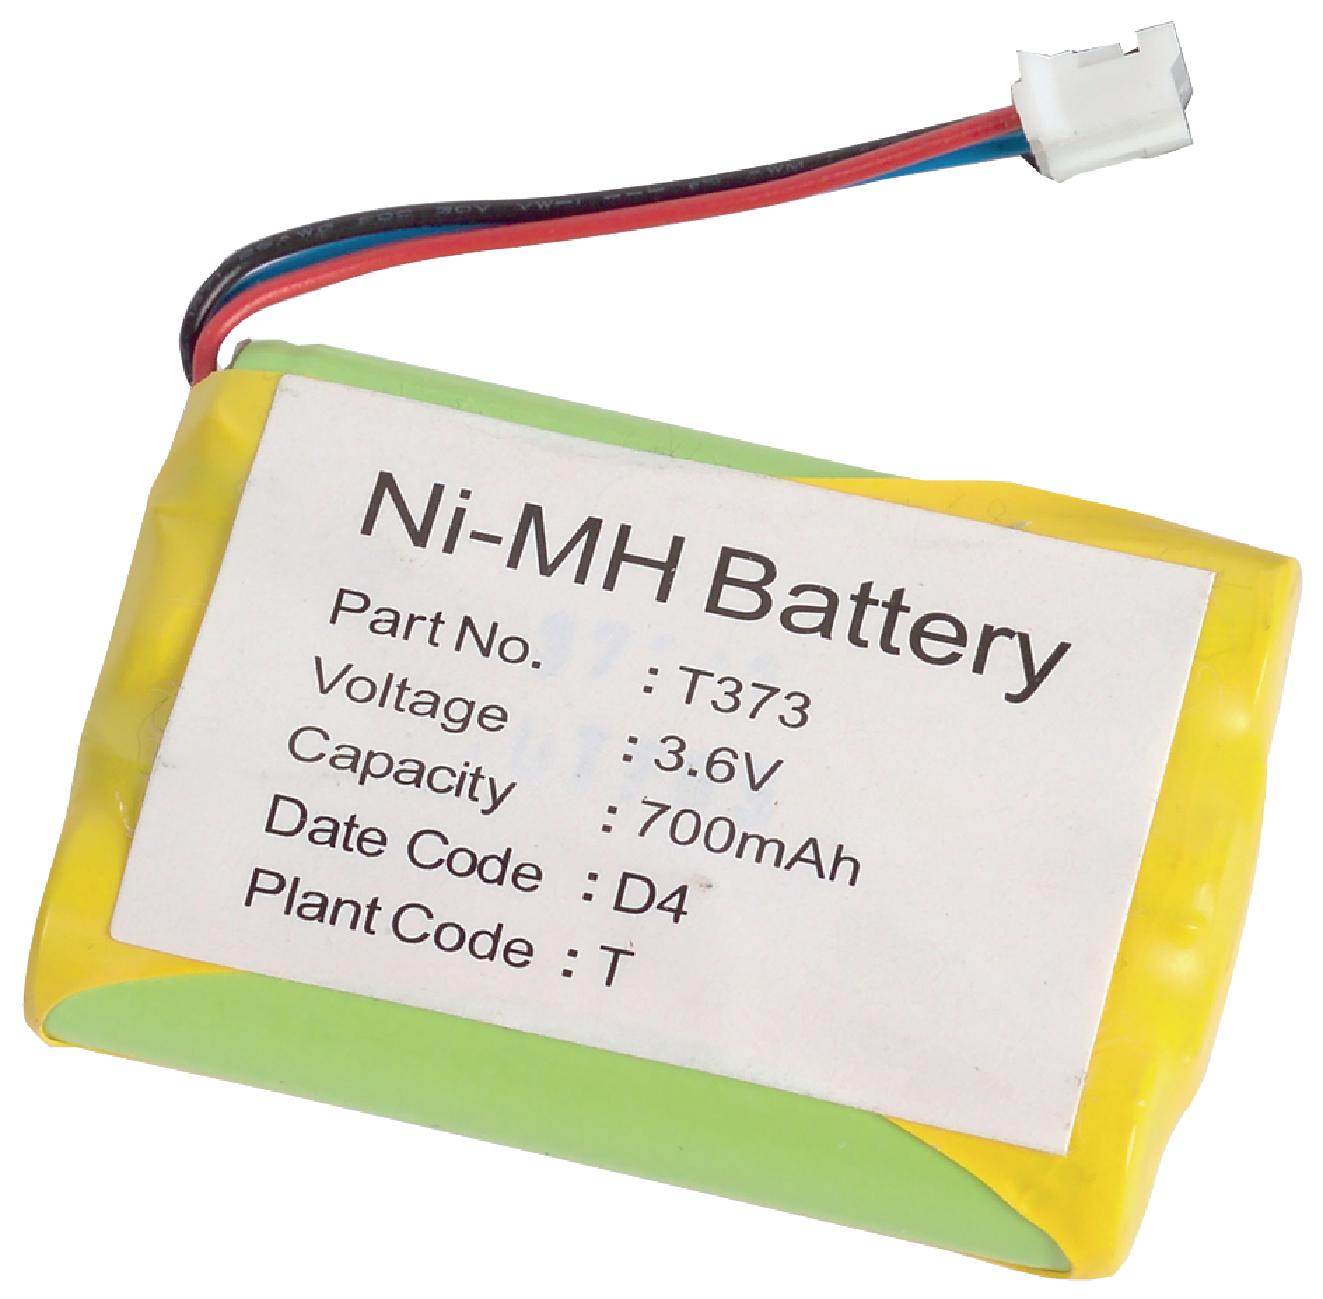 Akumulátor NiMH 3.6V/700mAh, ACCU-T373